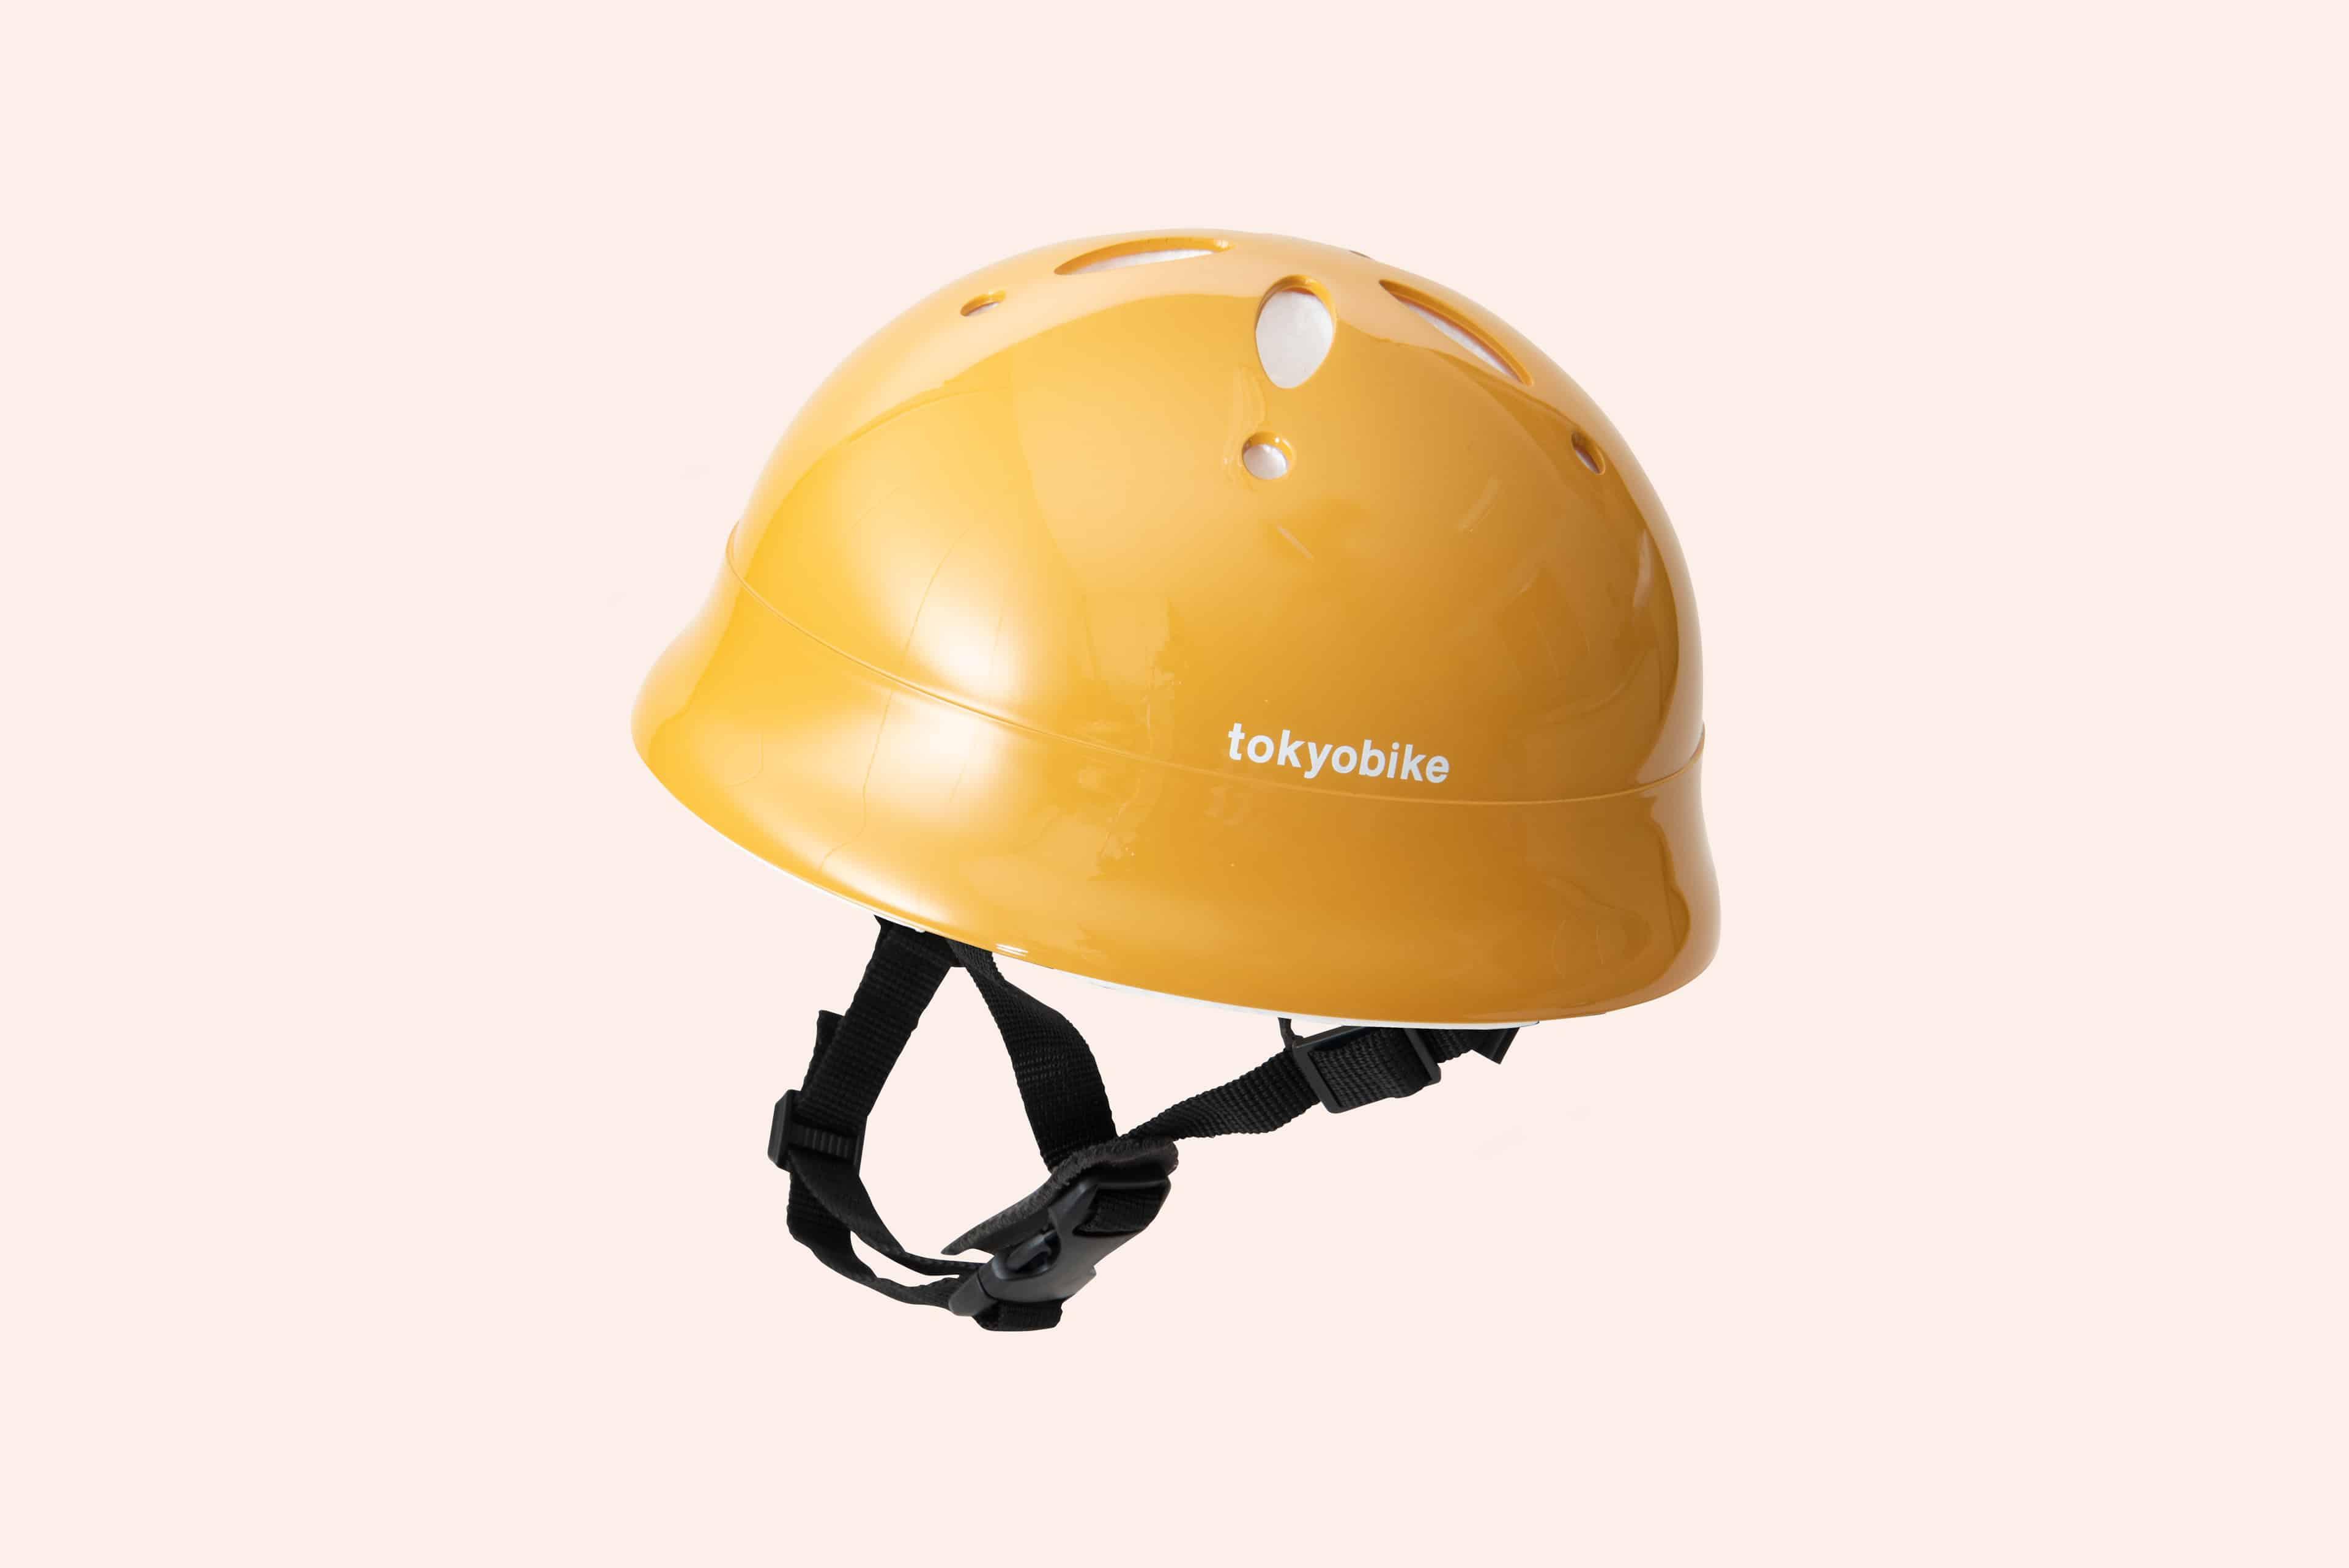 tokyobike TOKYOBIKE nicco キッズ用ヘルメット tokyobike paddle